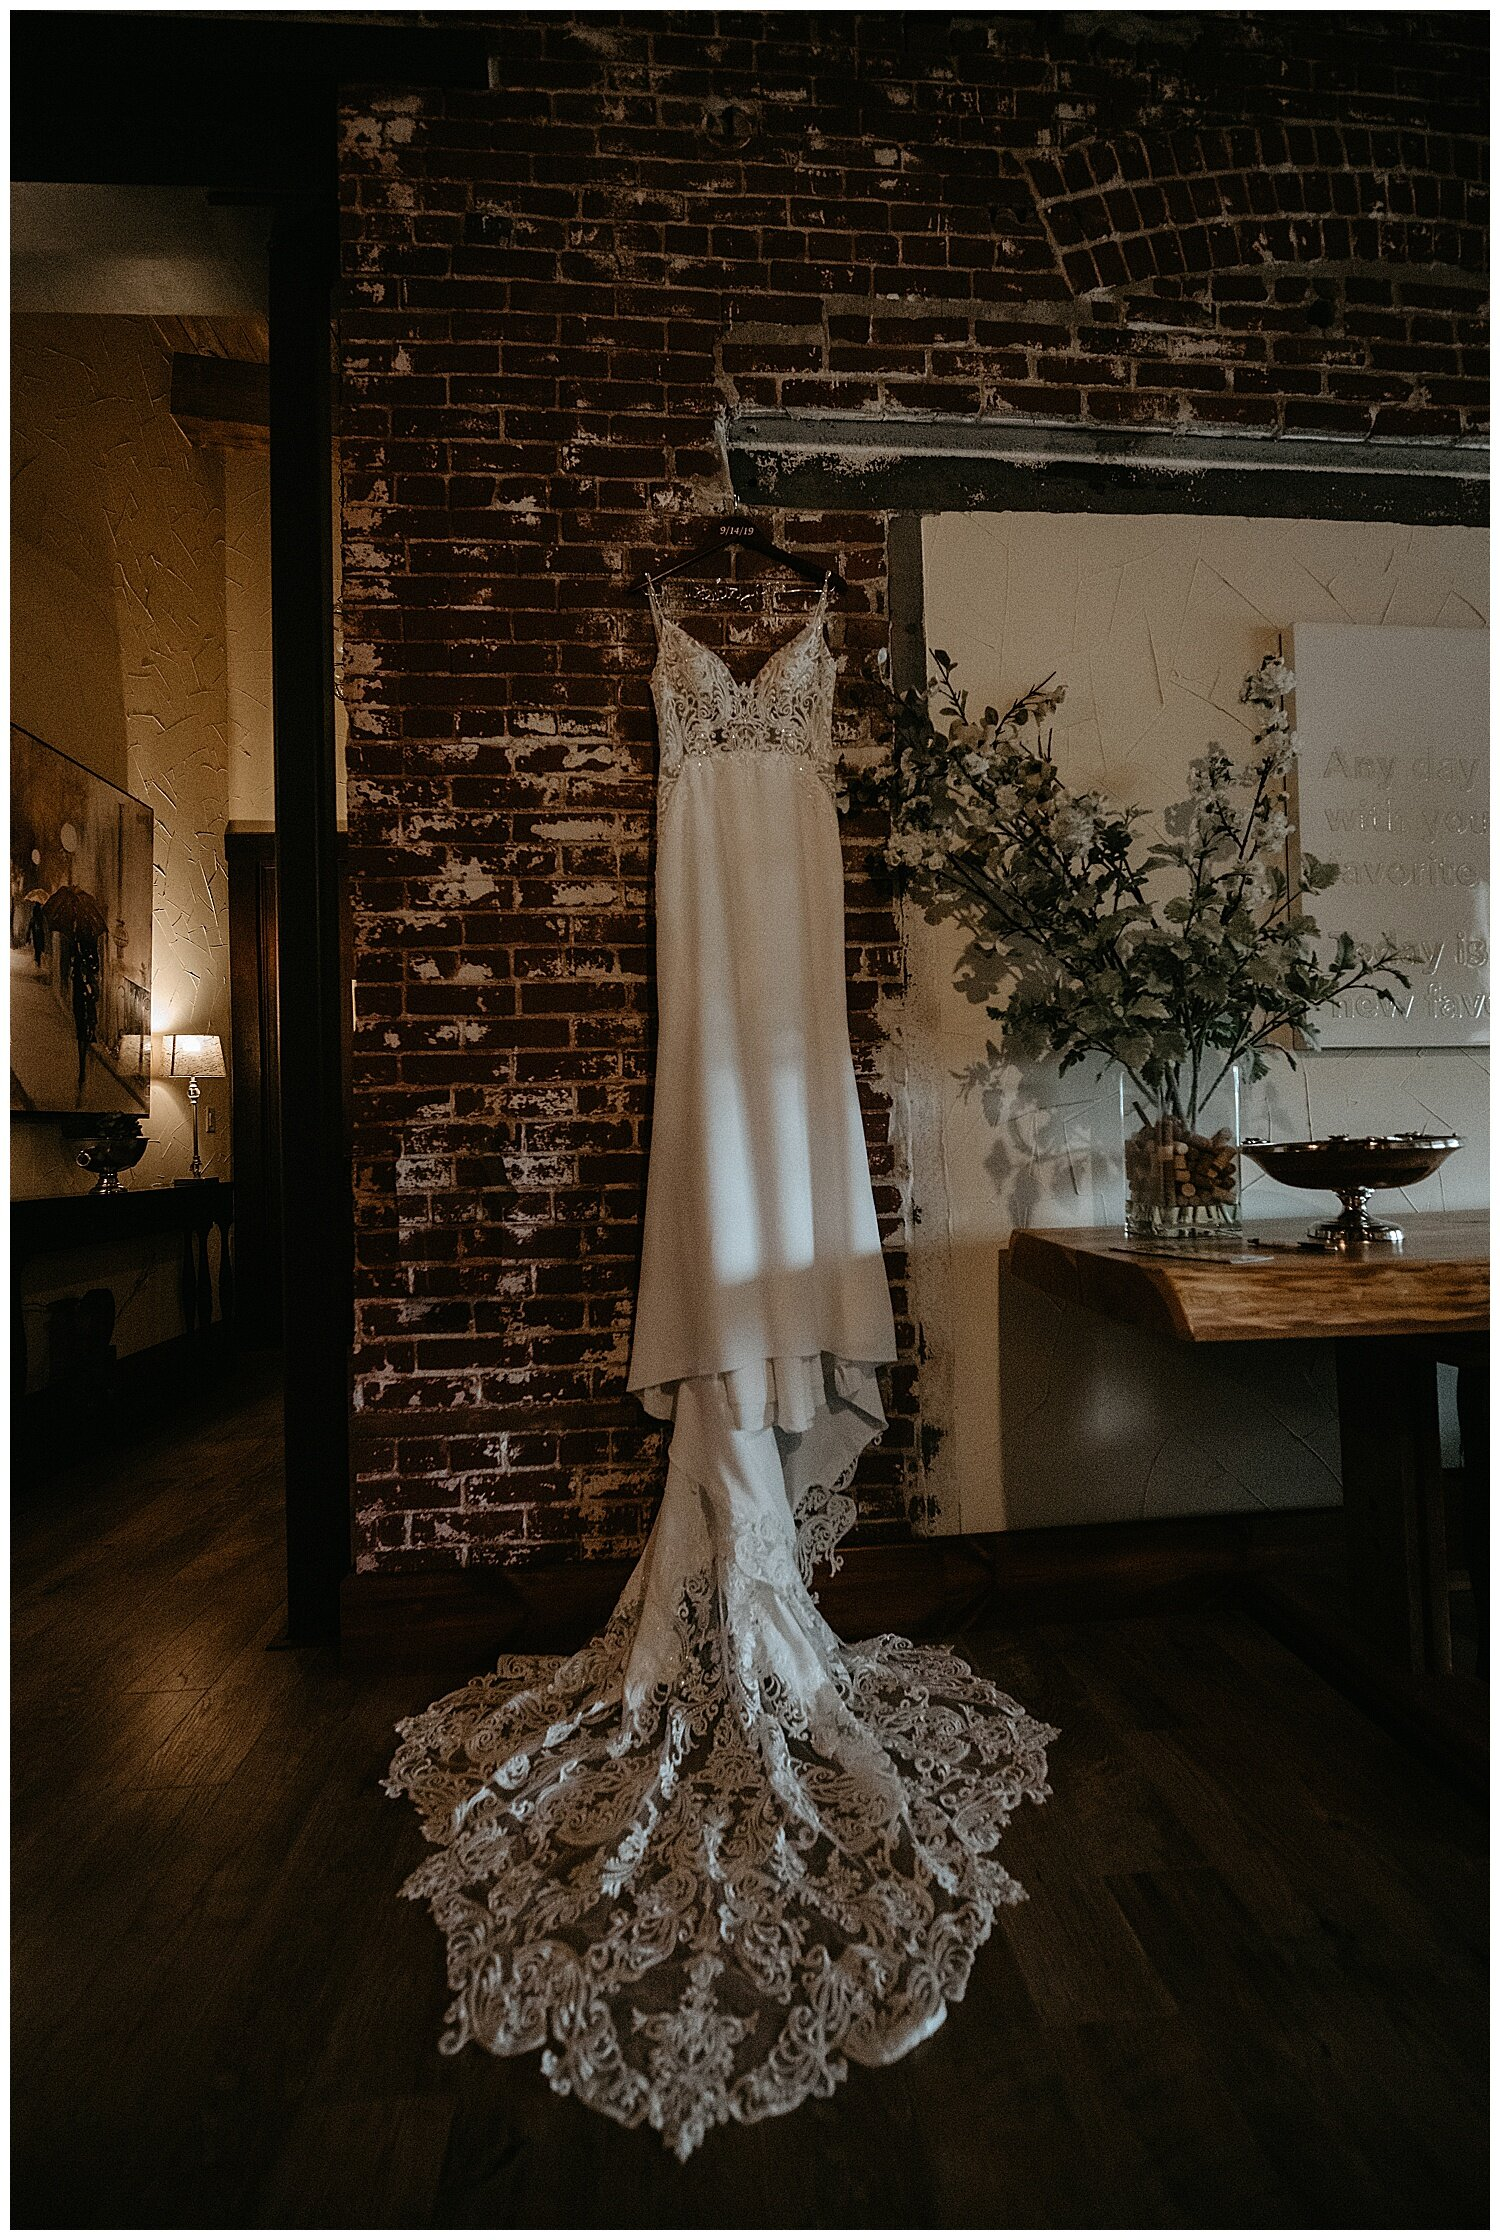 NEPA-Lewisburg-Wedding-Photographer-at-the-Rusty-Rail_0006.jpg